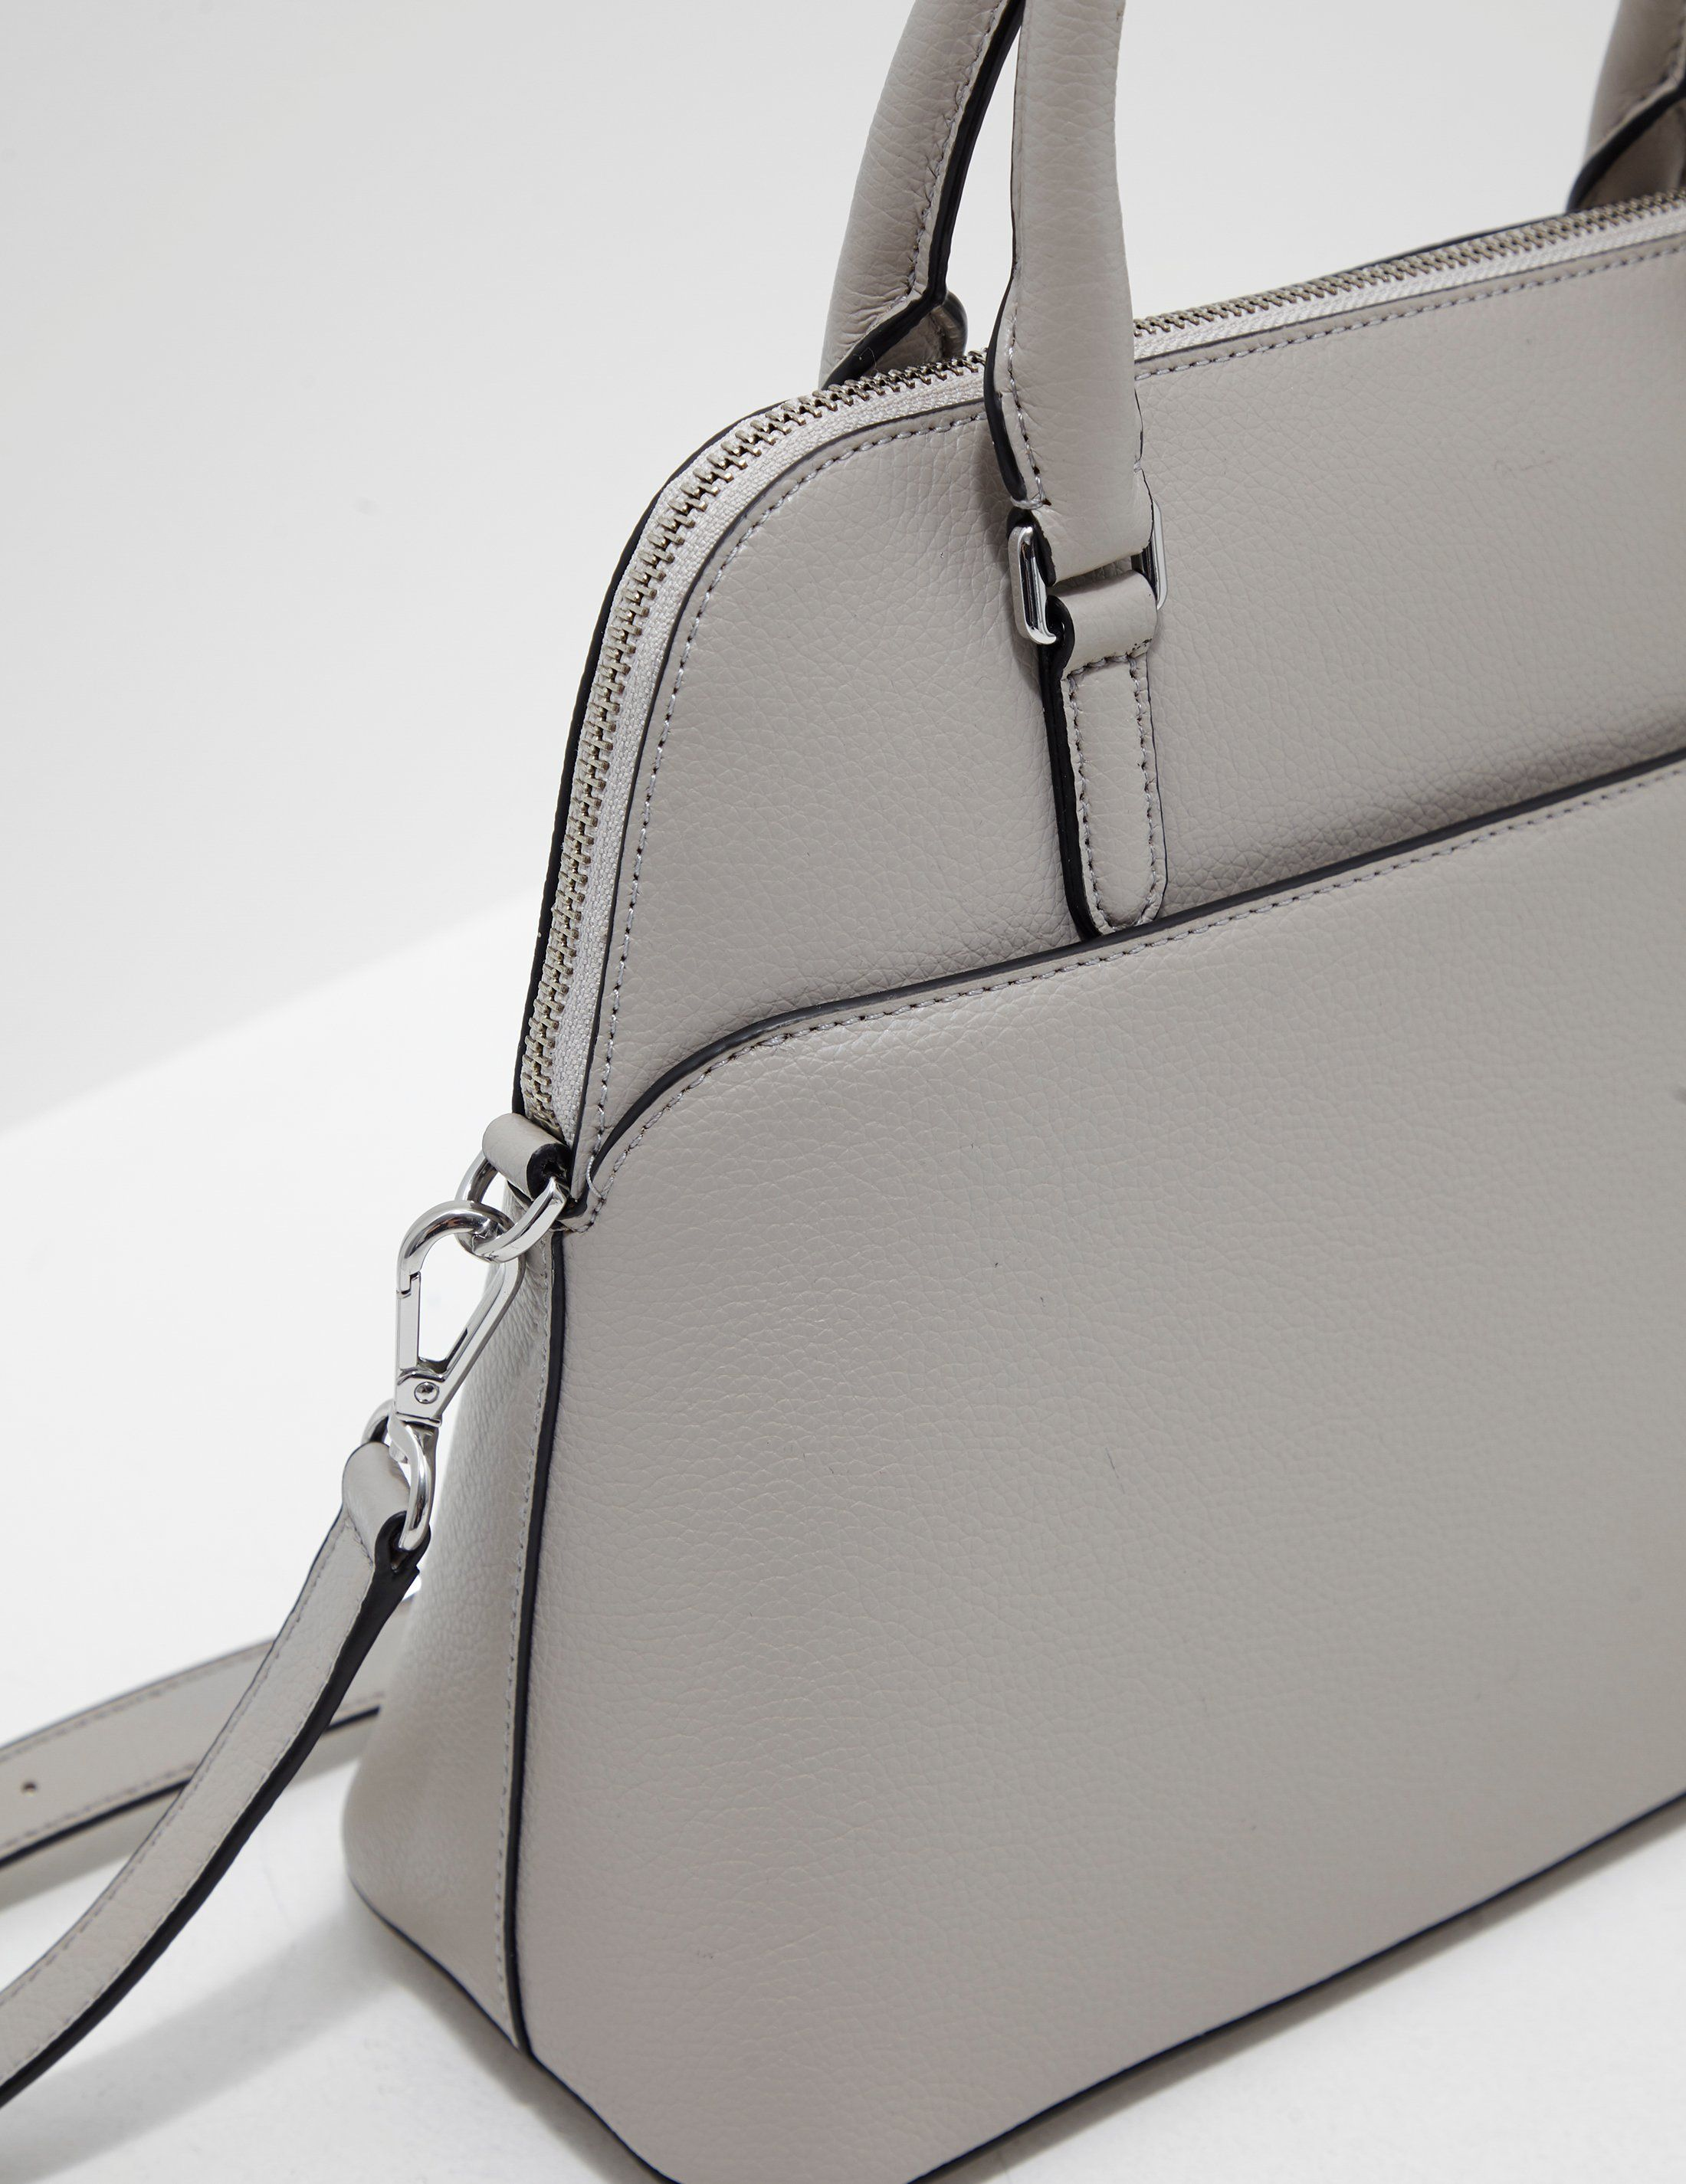 DKNY Dome Satchel Bag